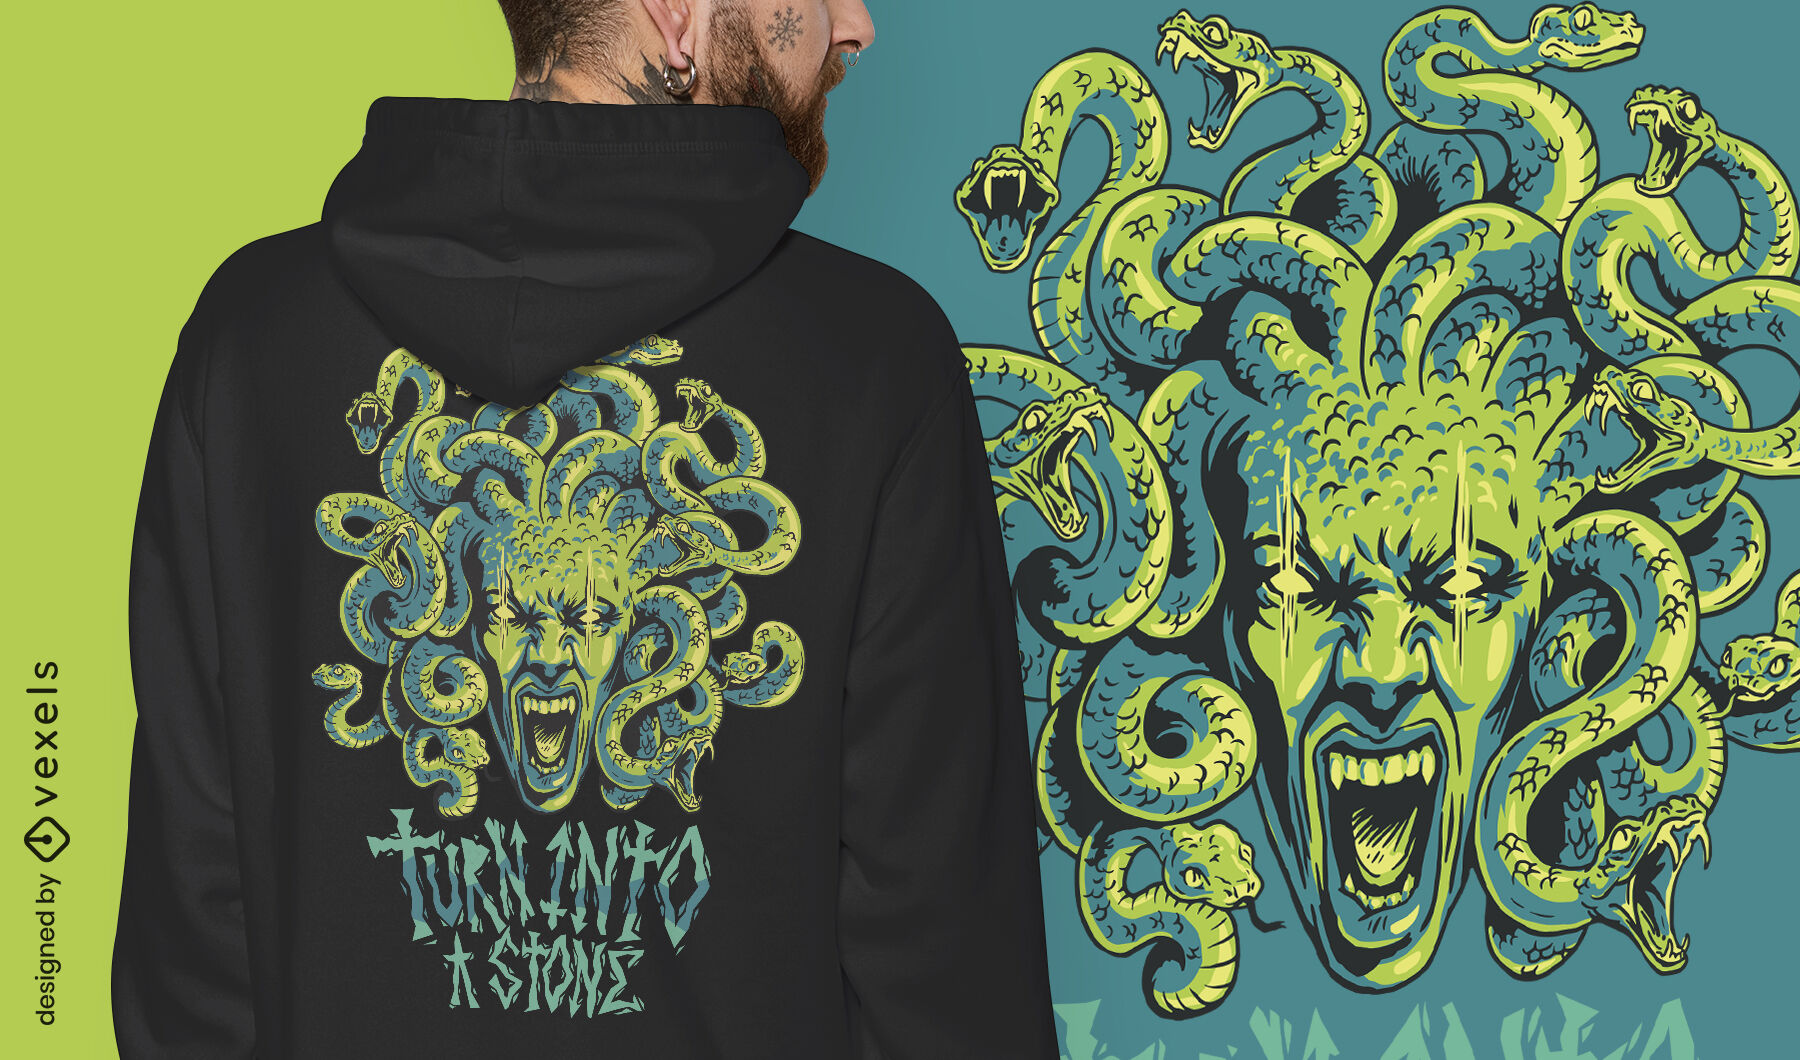 Medusa Monster mythisches Griechenland T-Shirt Design